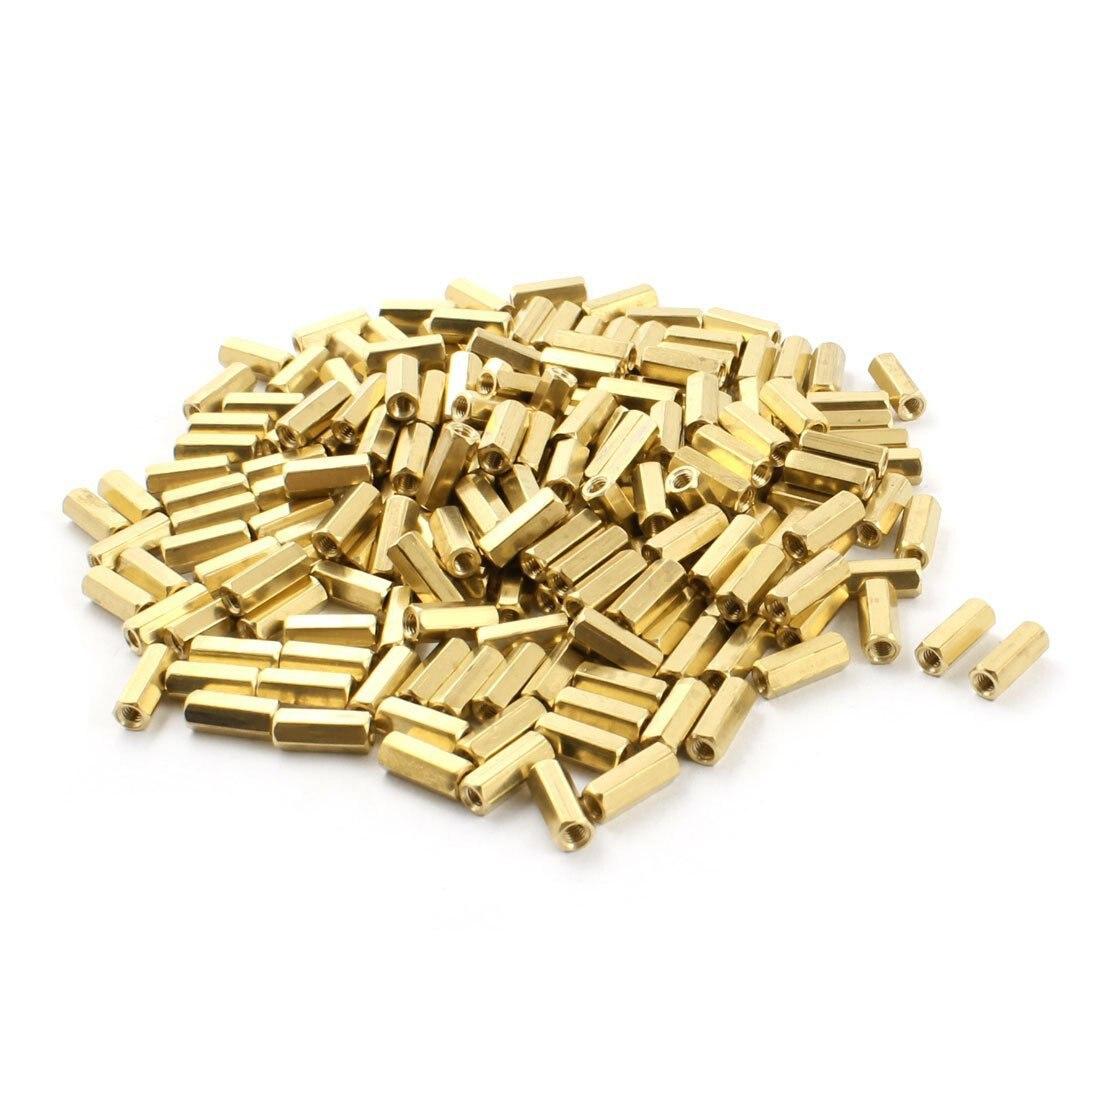 200Pcs Gold Tone M3 Female Thread Brass Pillar PCB Standoff Hexagonal Spacer 12mm for PCB circuit boards and machine boards200Pcs Gold Tone M3 Female Thread Brass Pillar PCB Standoff Hexagonal Spacer 12mm for PCB circuit boards and machine boards